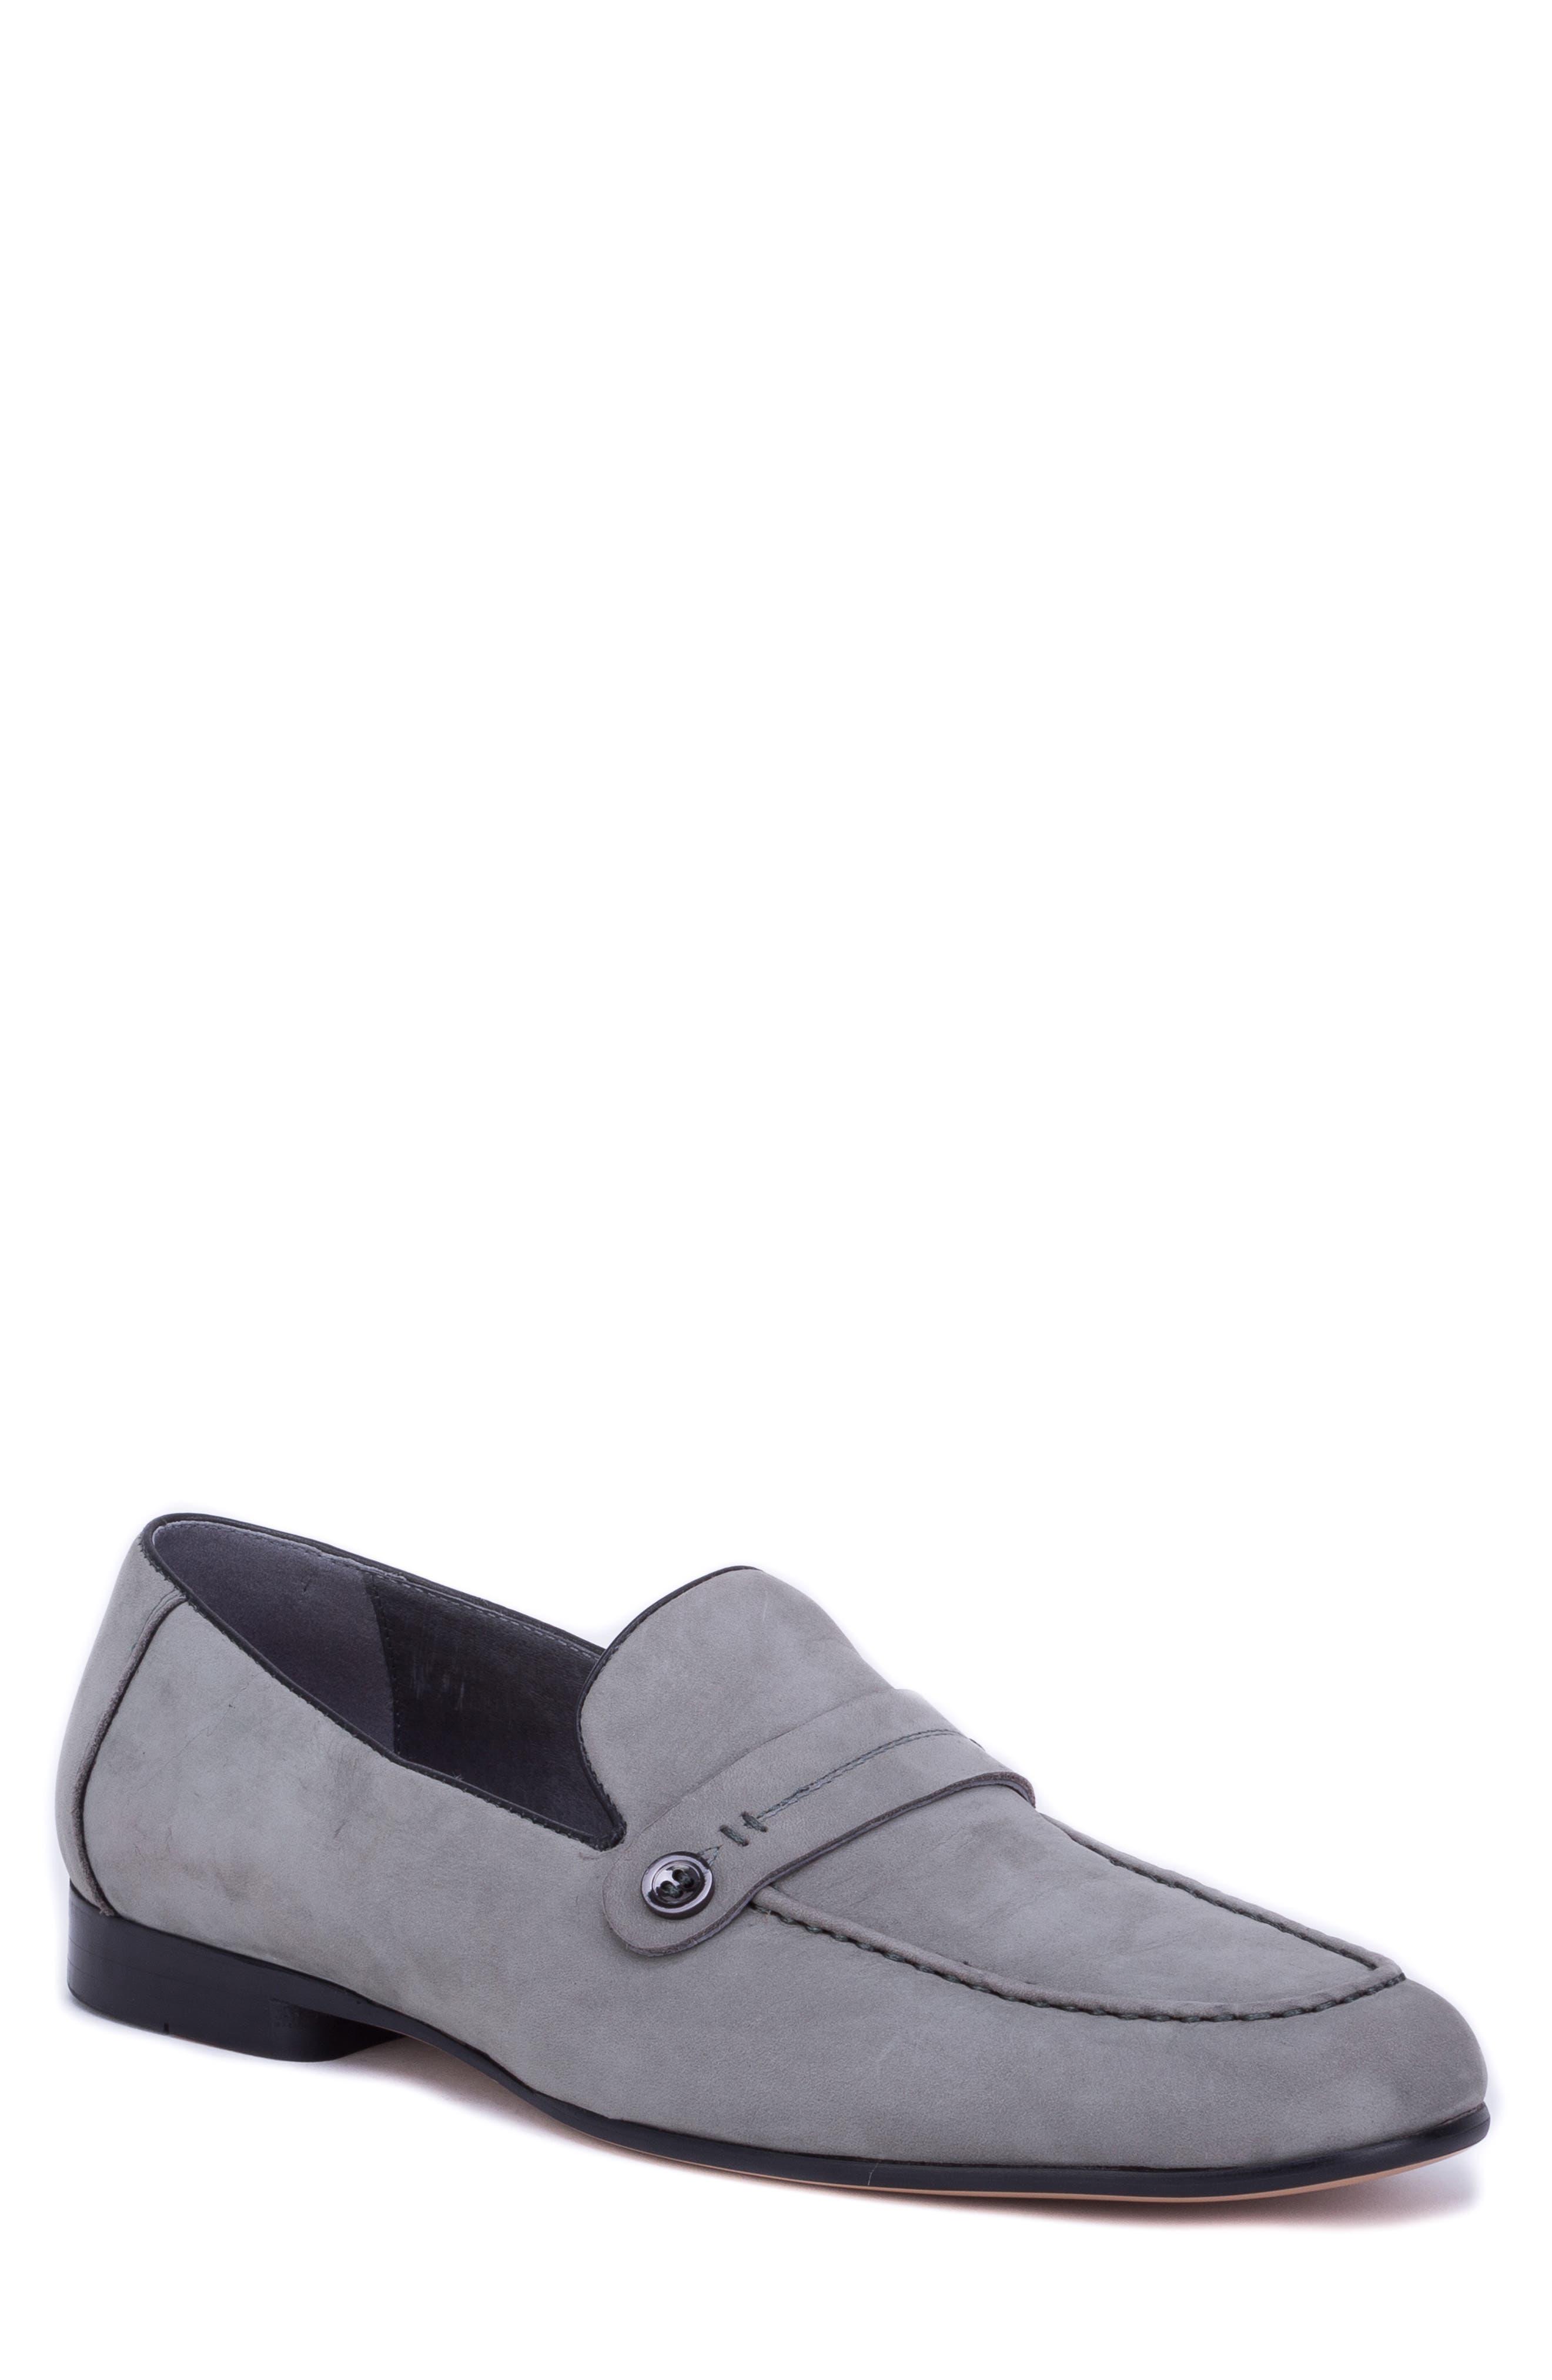 Robert Graham Norris Button Loafer, Grey